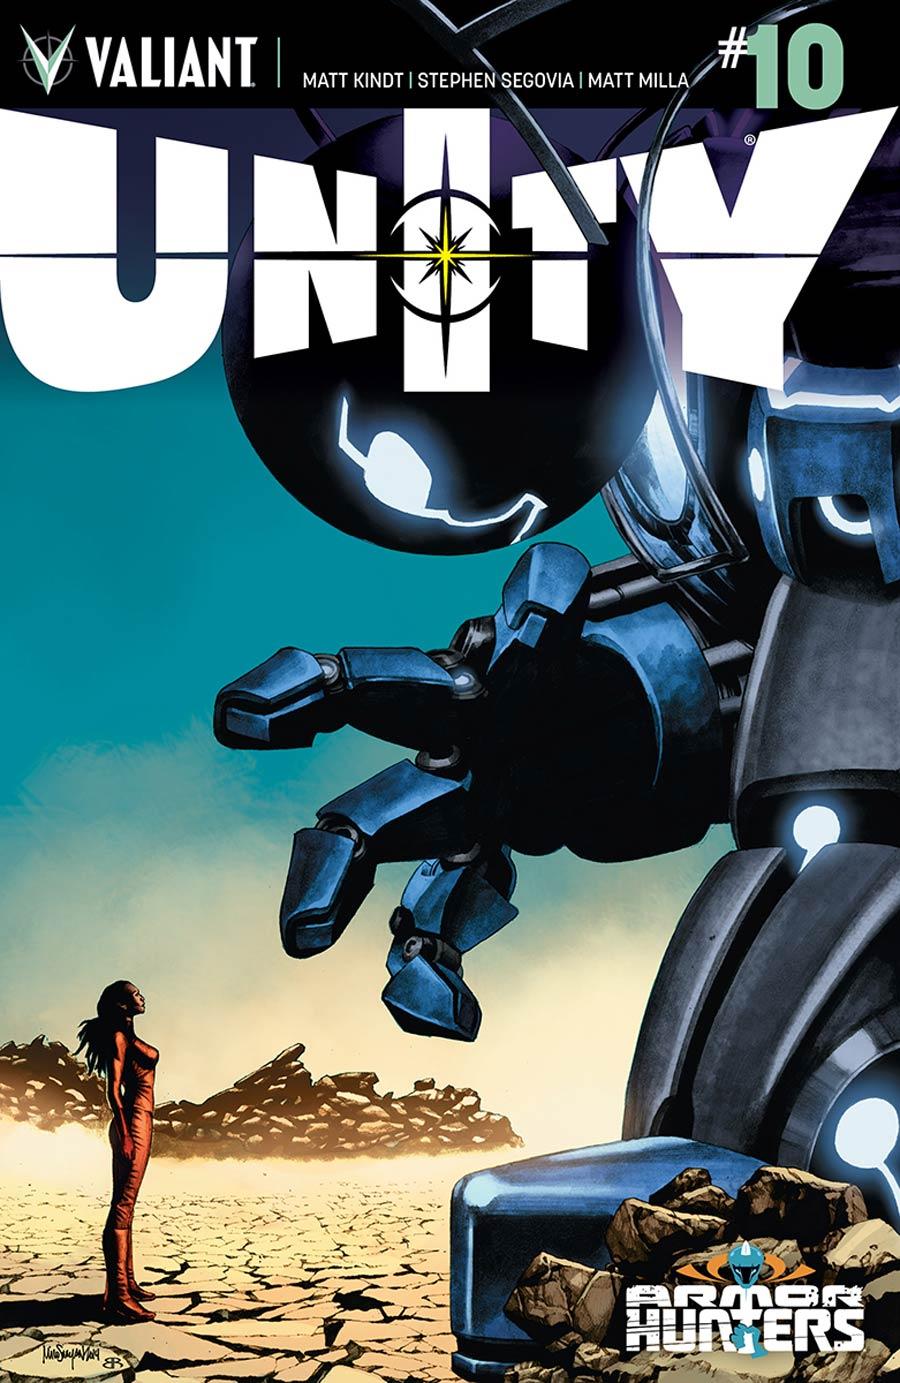 Unity Vol 2 #10 Cover A Regular Mico Suayan Cover (Armor Hunters Tie-In)